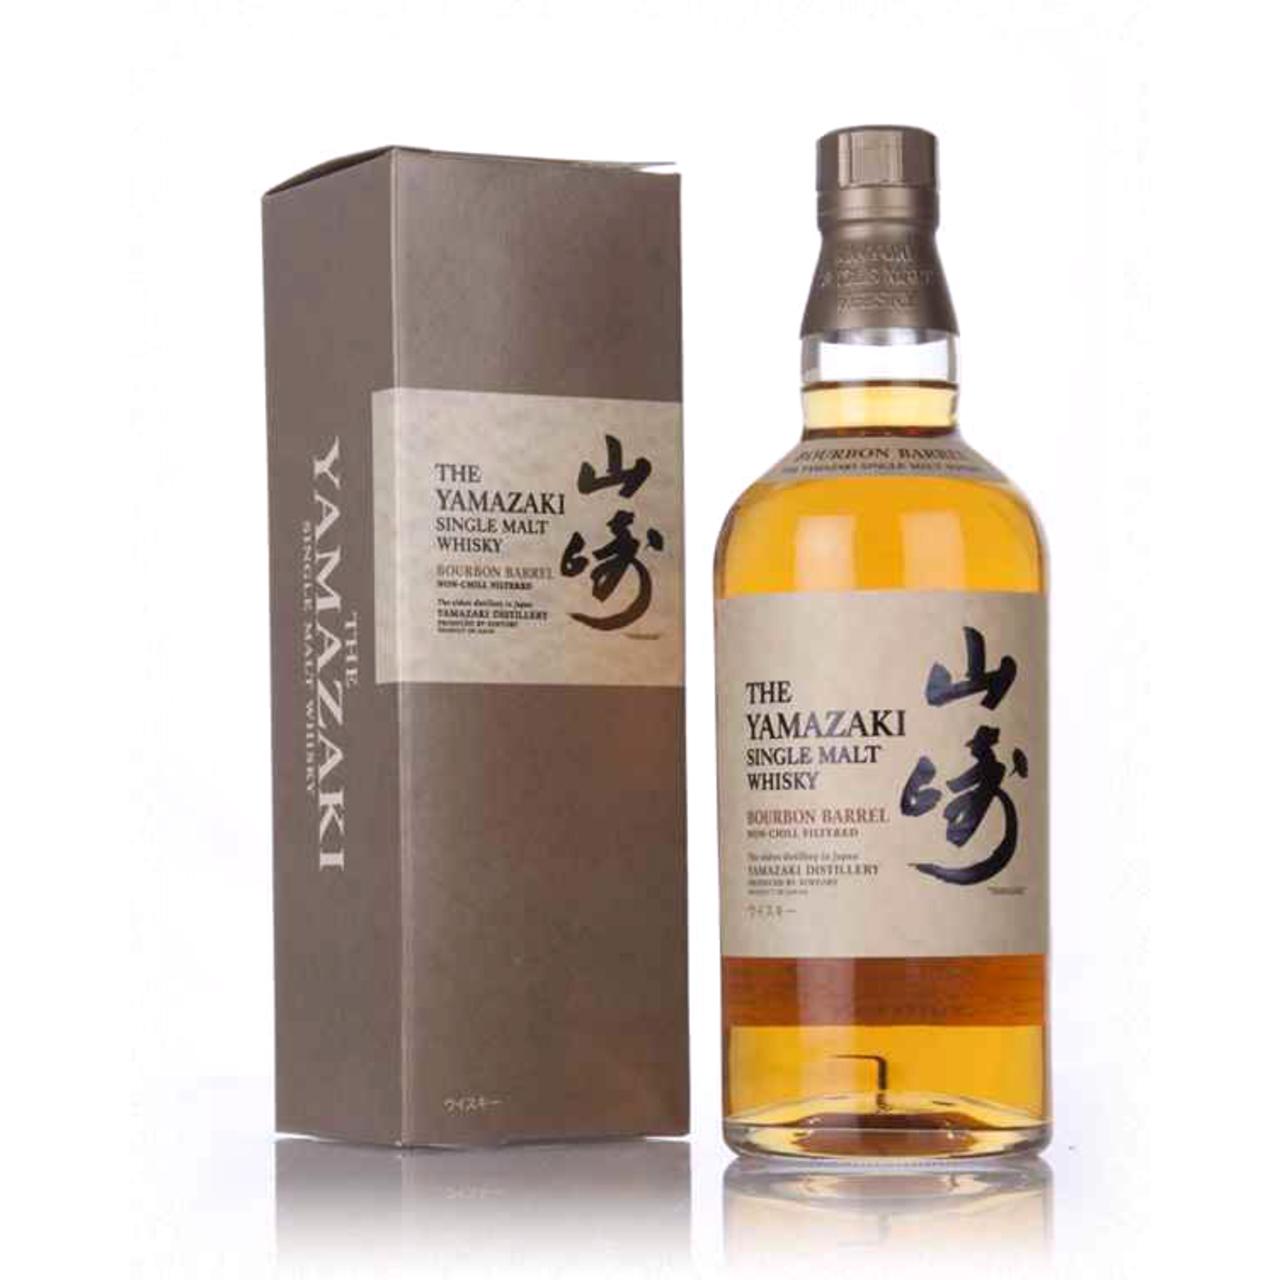 Yamazaki bourbon barrel 2011 48 whisky